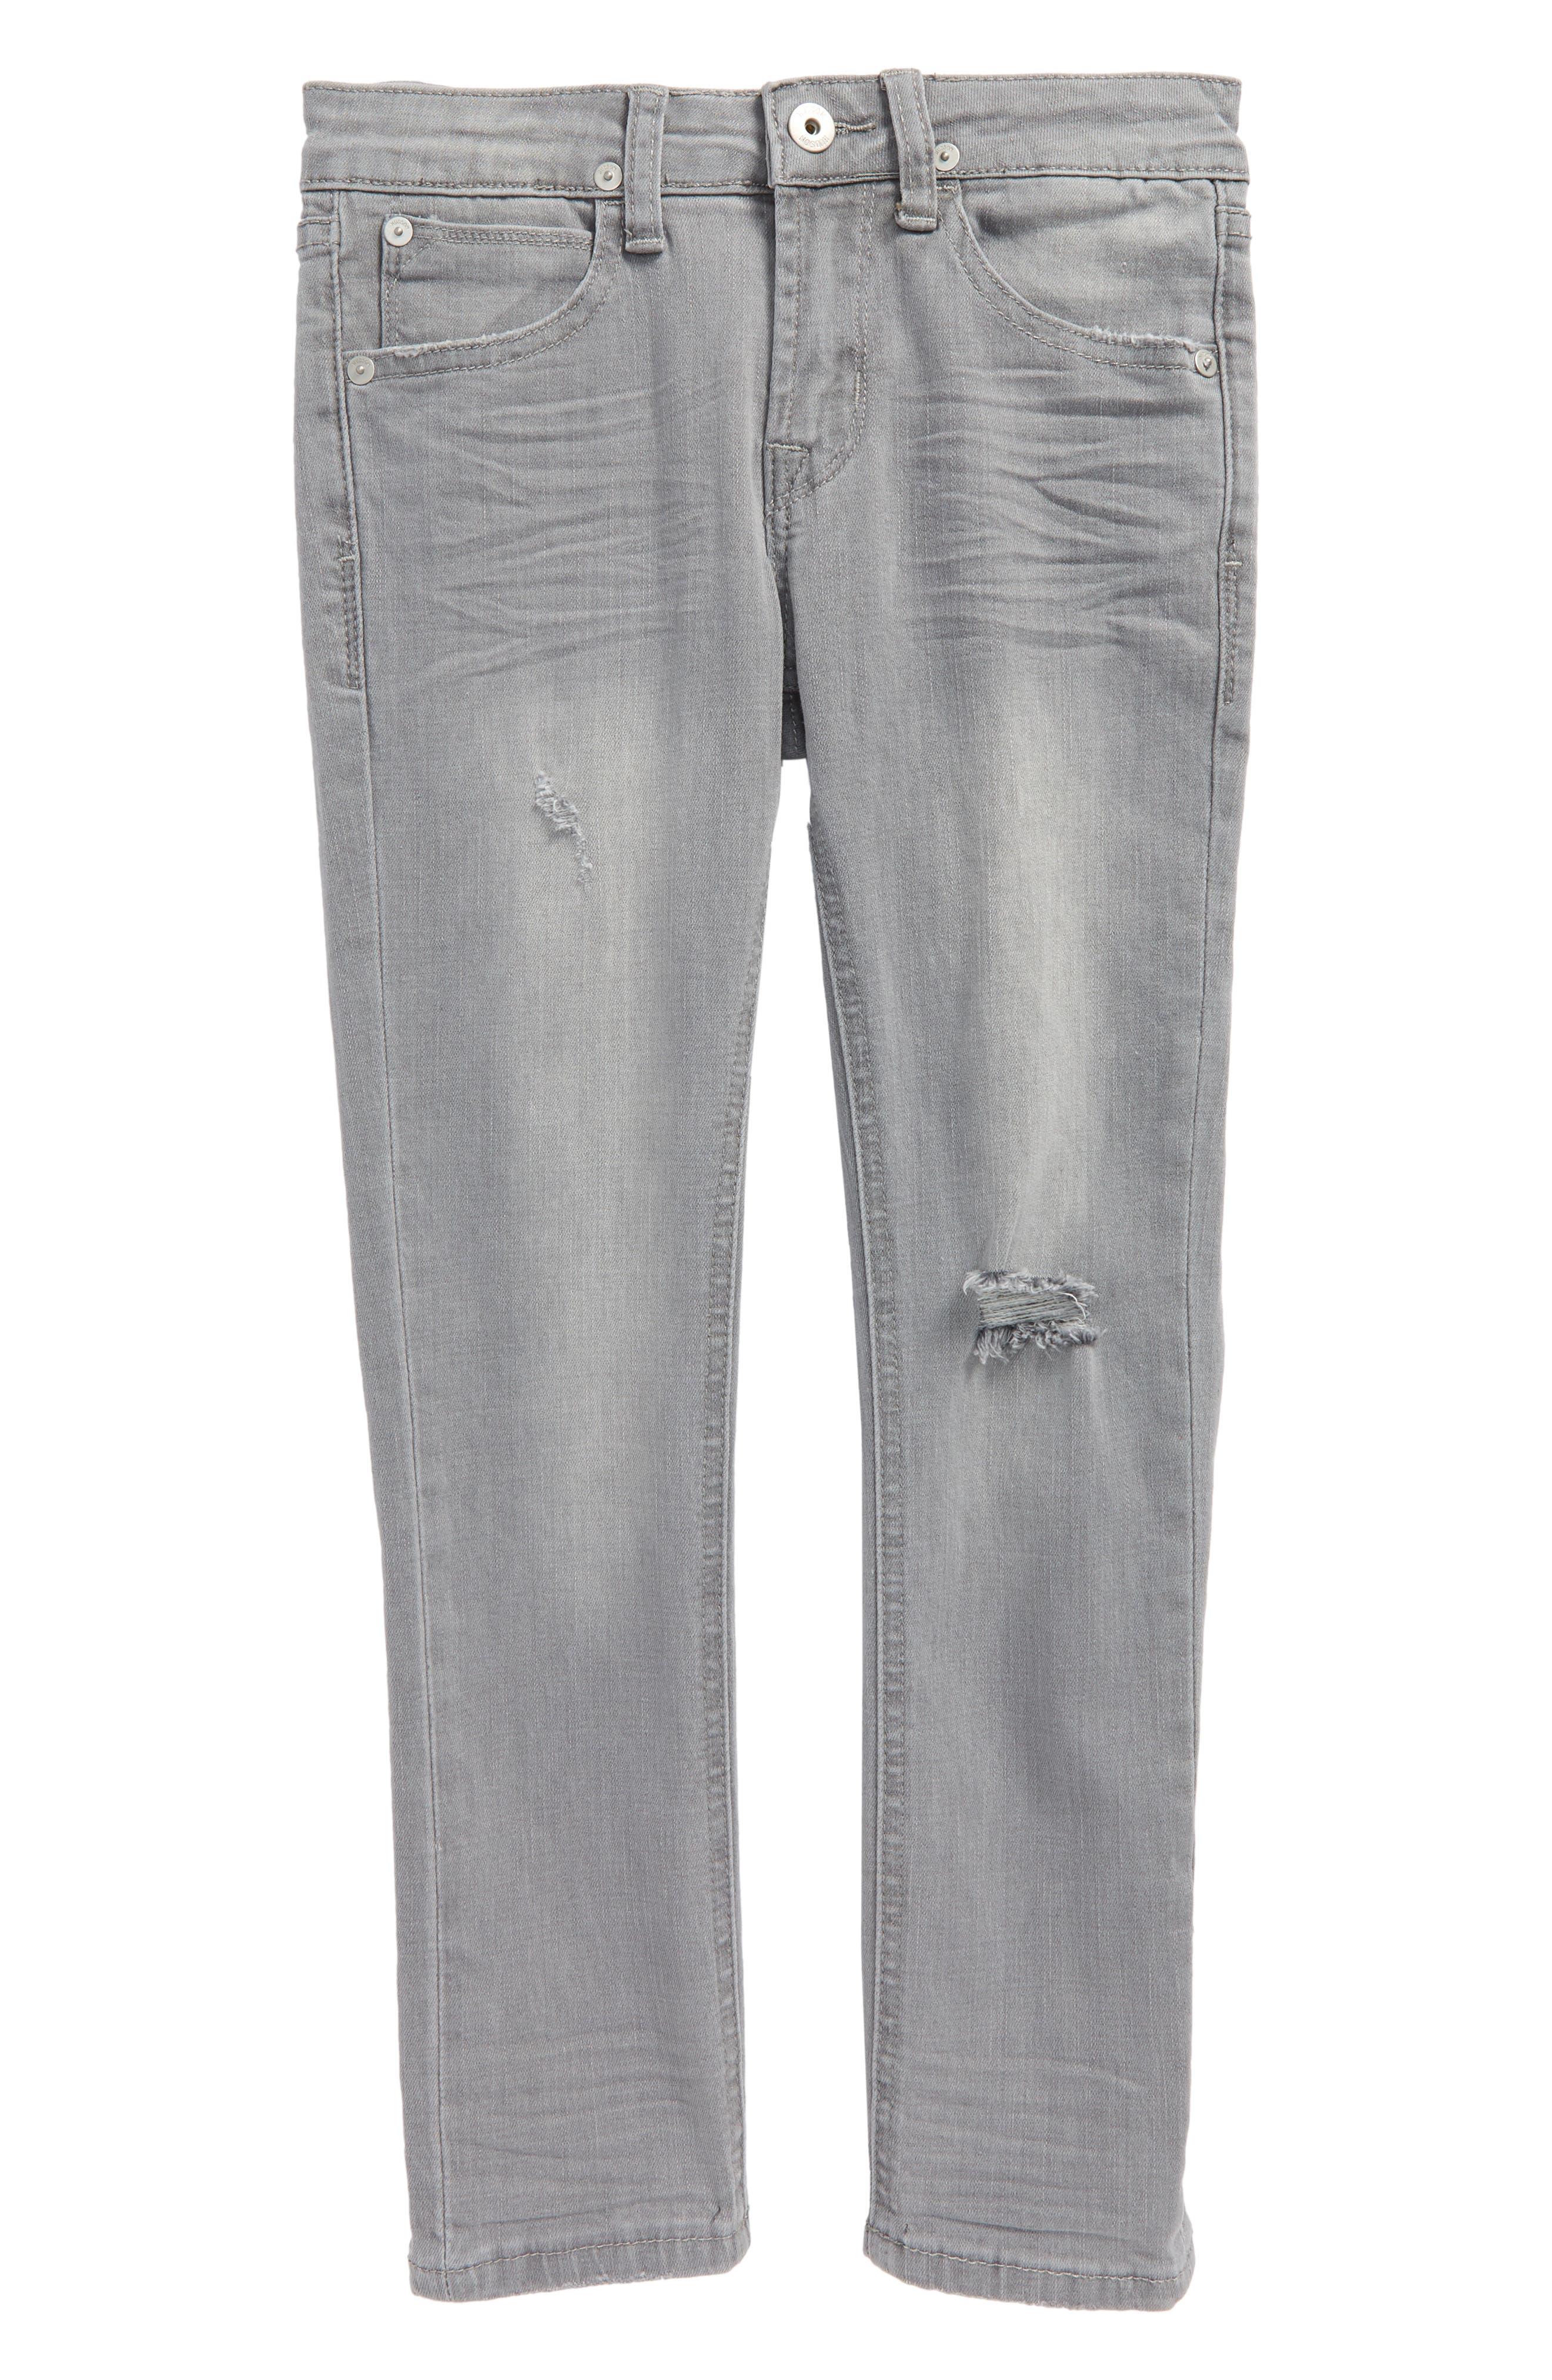 Main Image - Hudson Kids Jude Slim Fit Skinny Jeans (Toddler Boys & Little Boys)